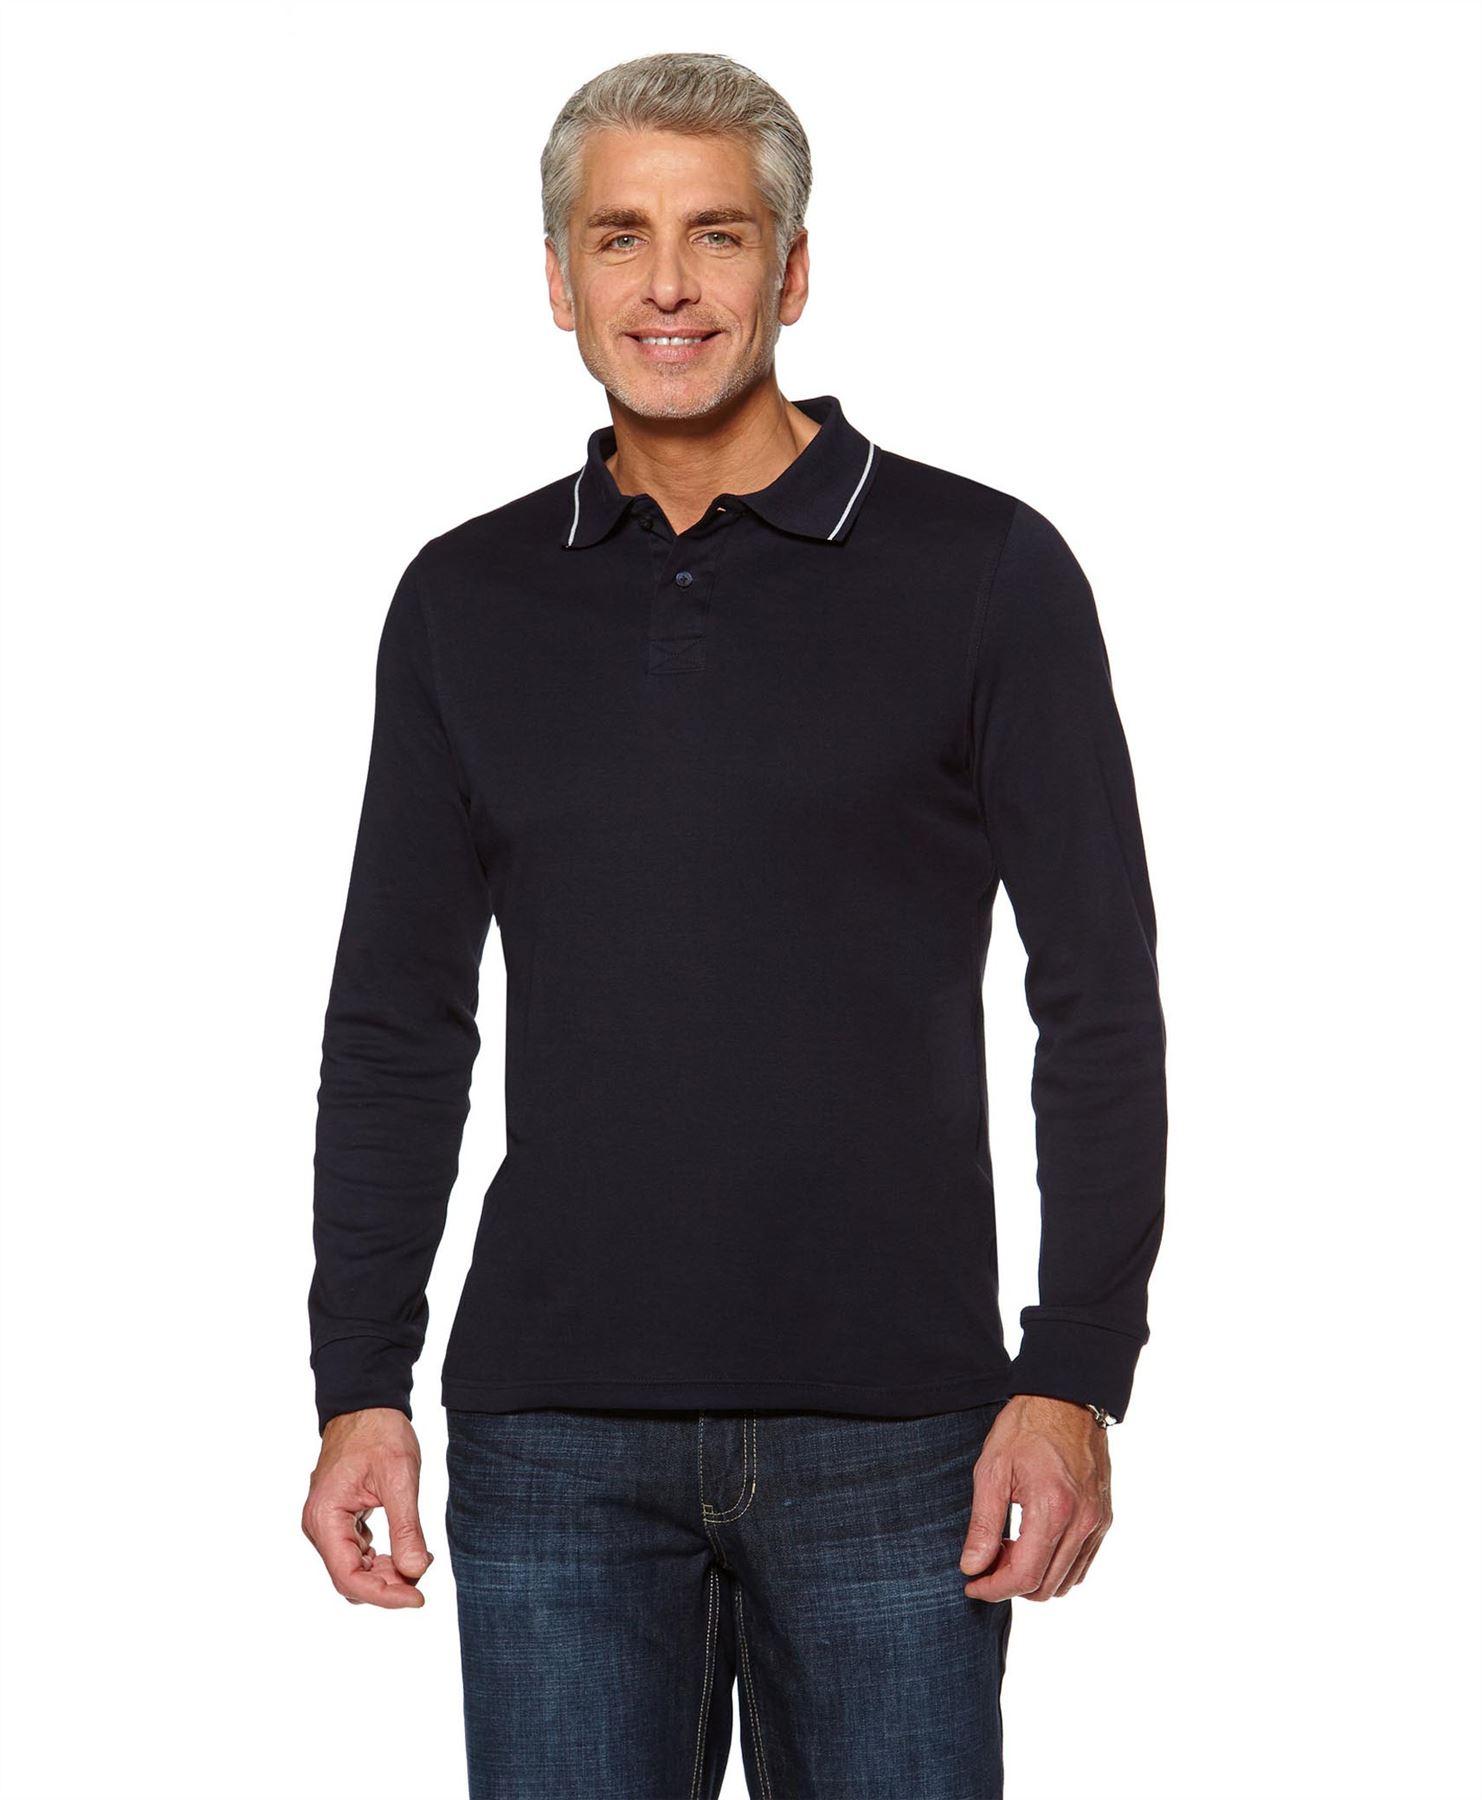 Polo longues homme coton uni T-shirt haut manches longues Polo jersey extensible Tops Taille S-3XL 33c219